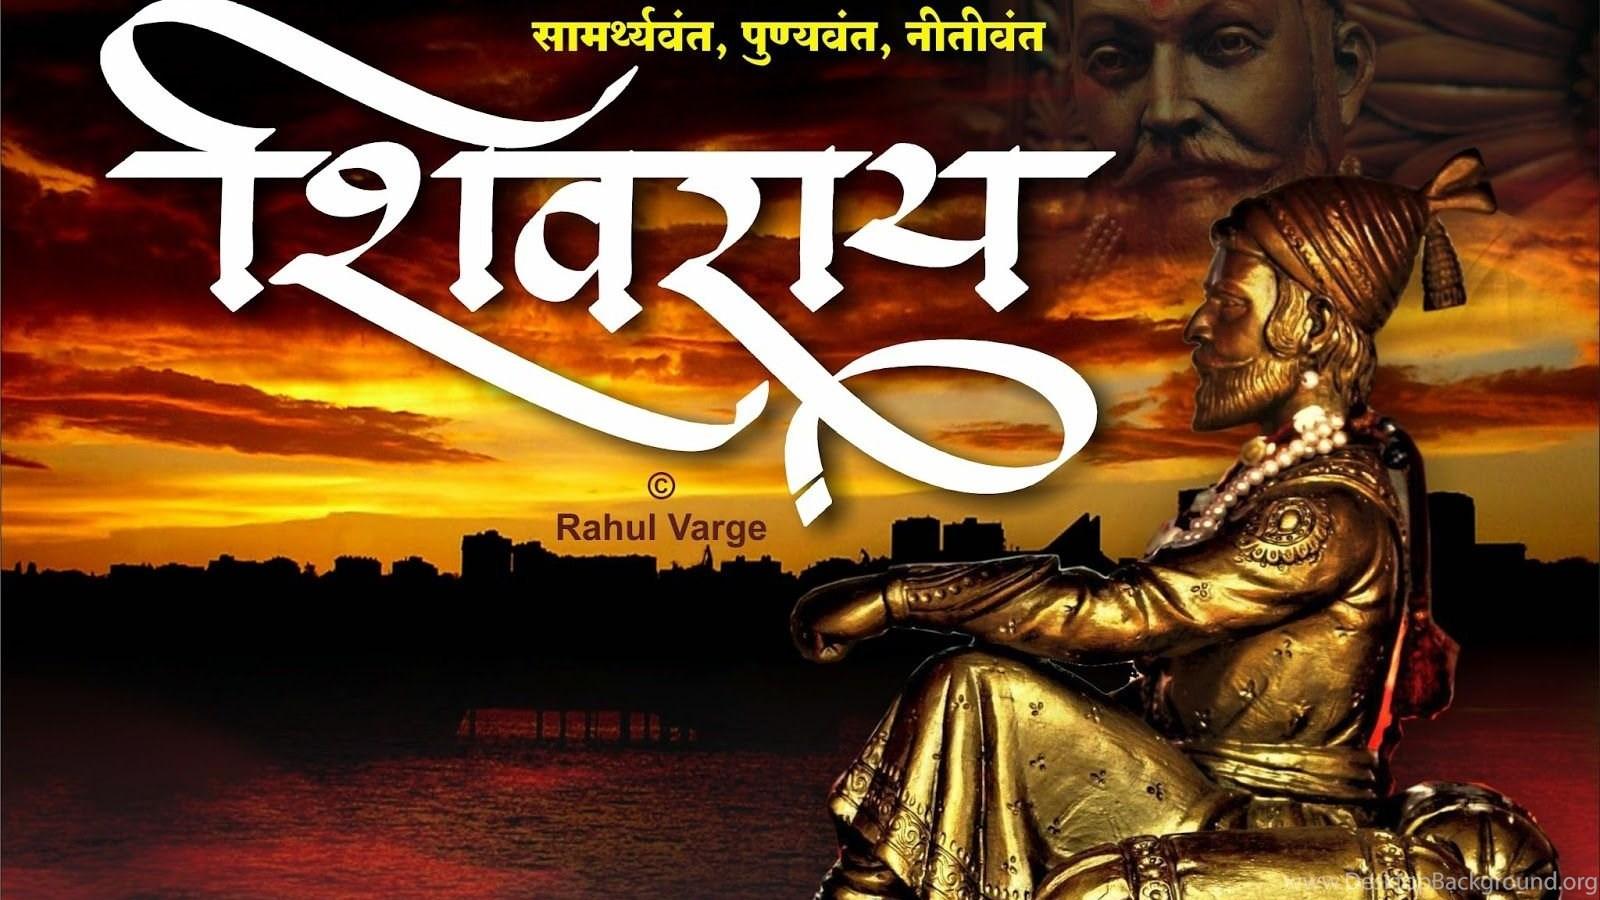 shivray shivaji maharaj hd marathi wallpapers desktop background